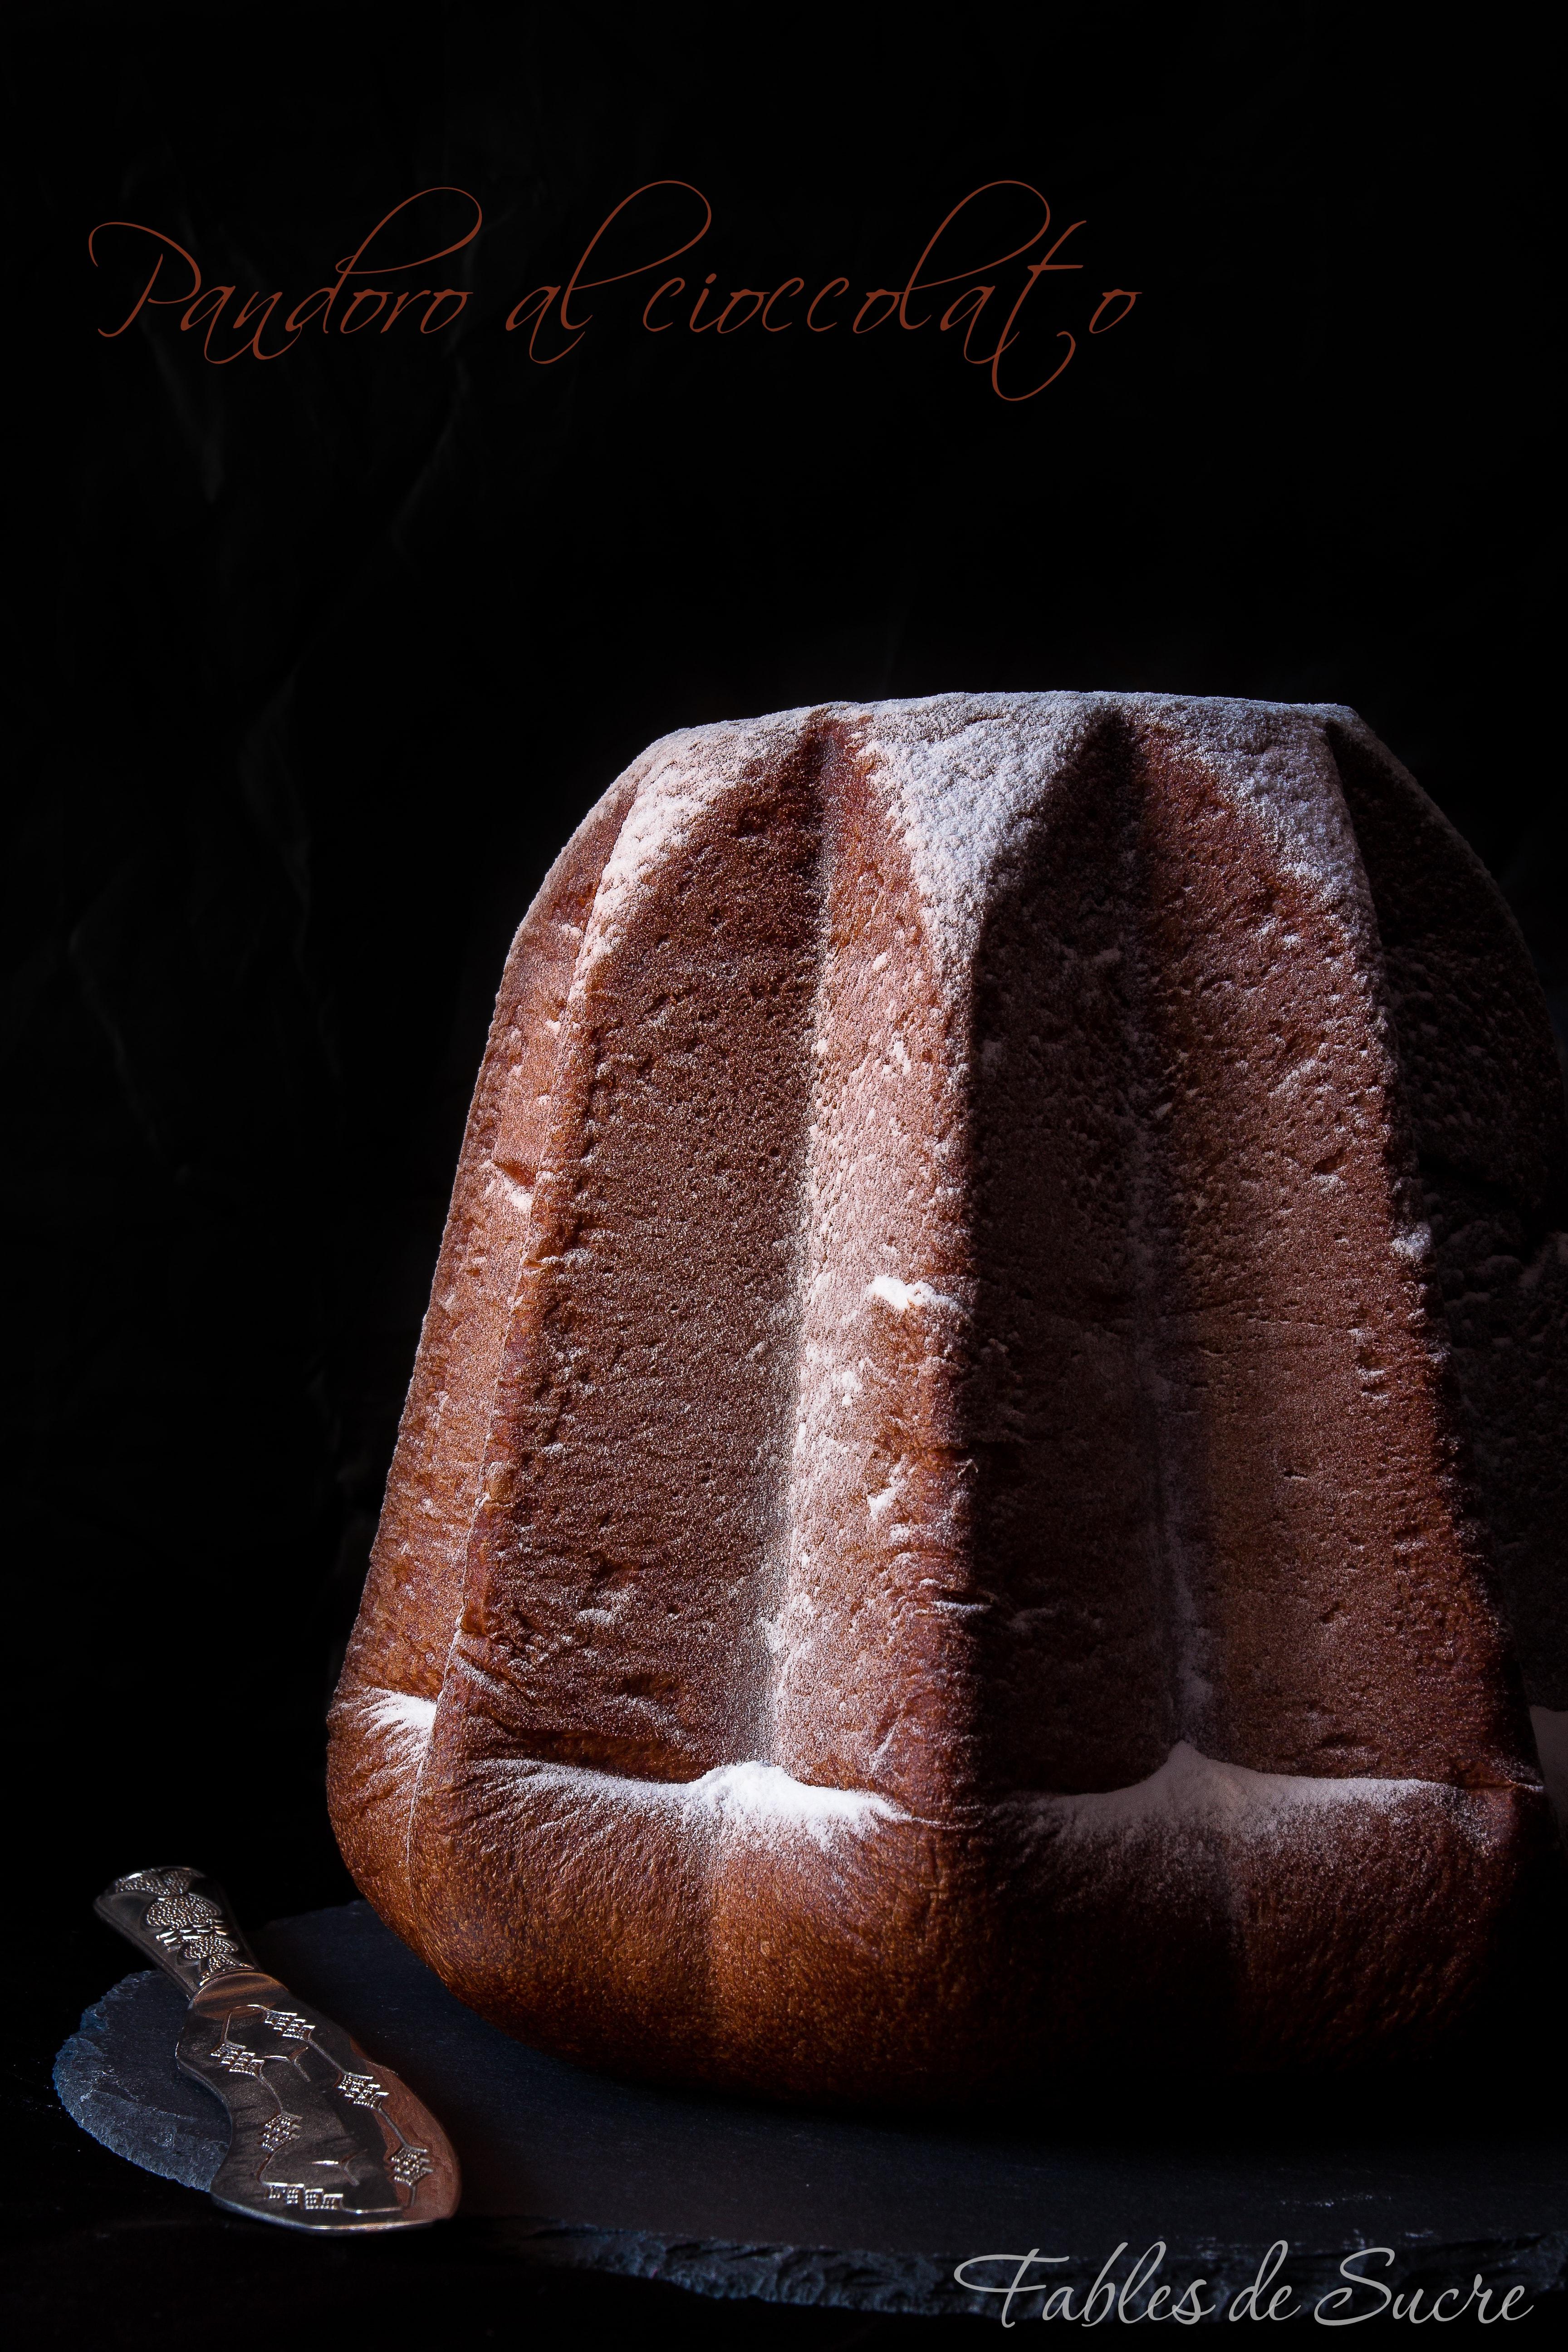 Pandoro al cioccolato